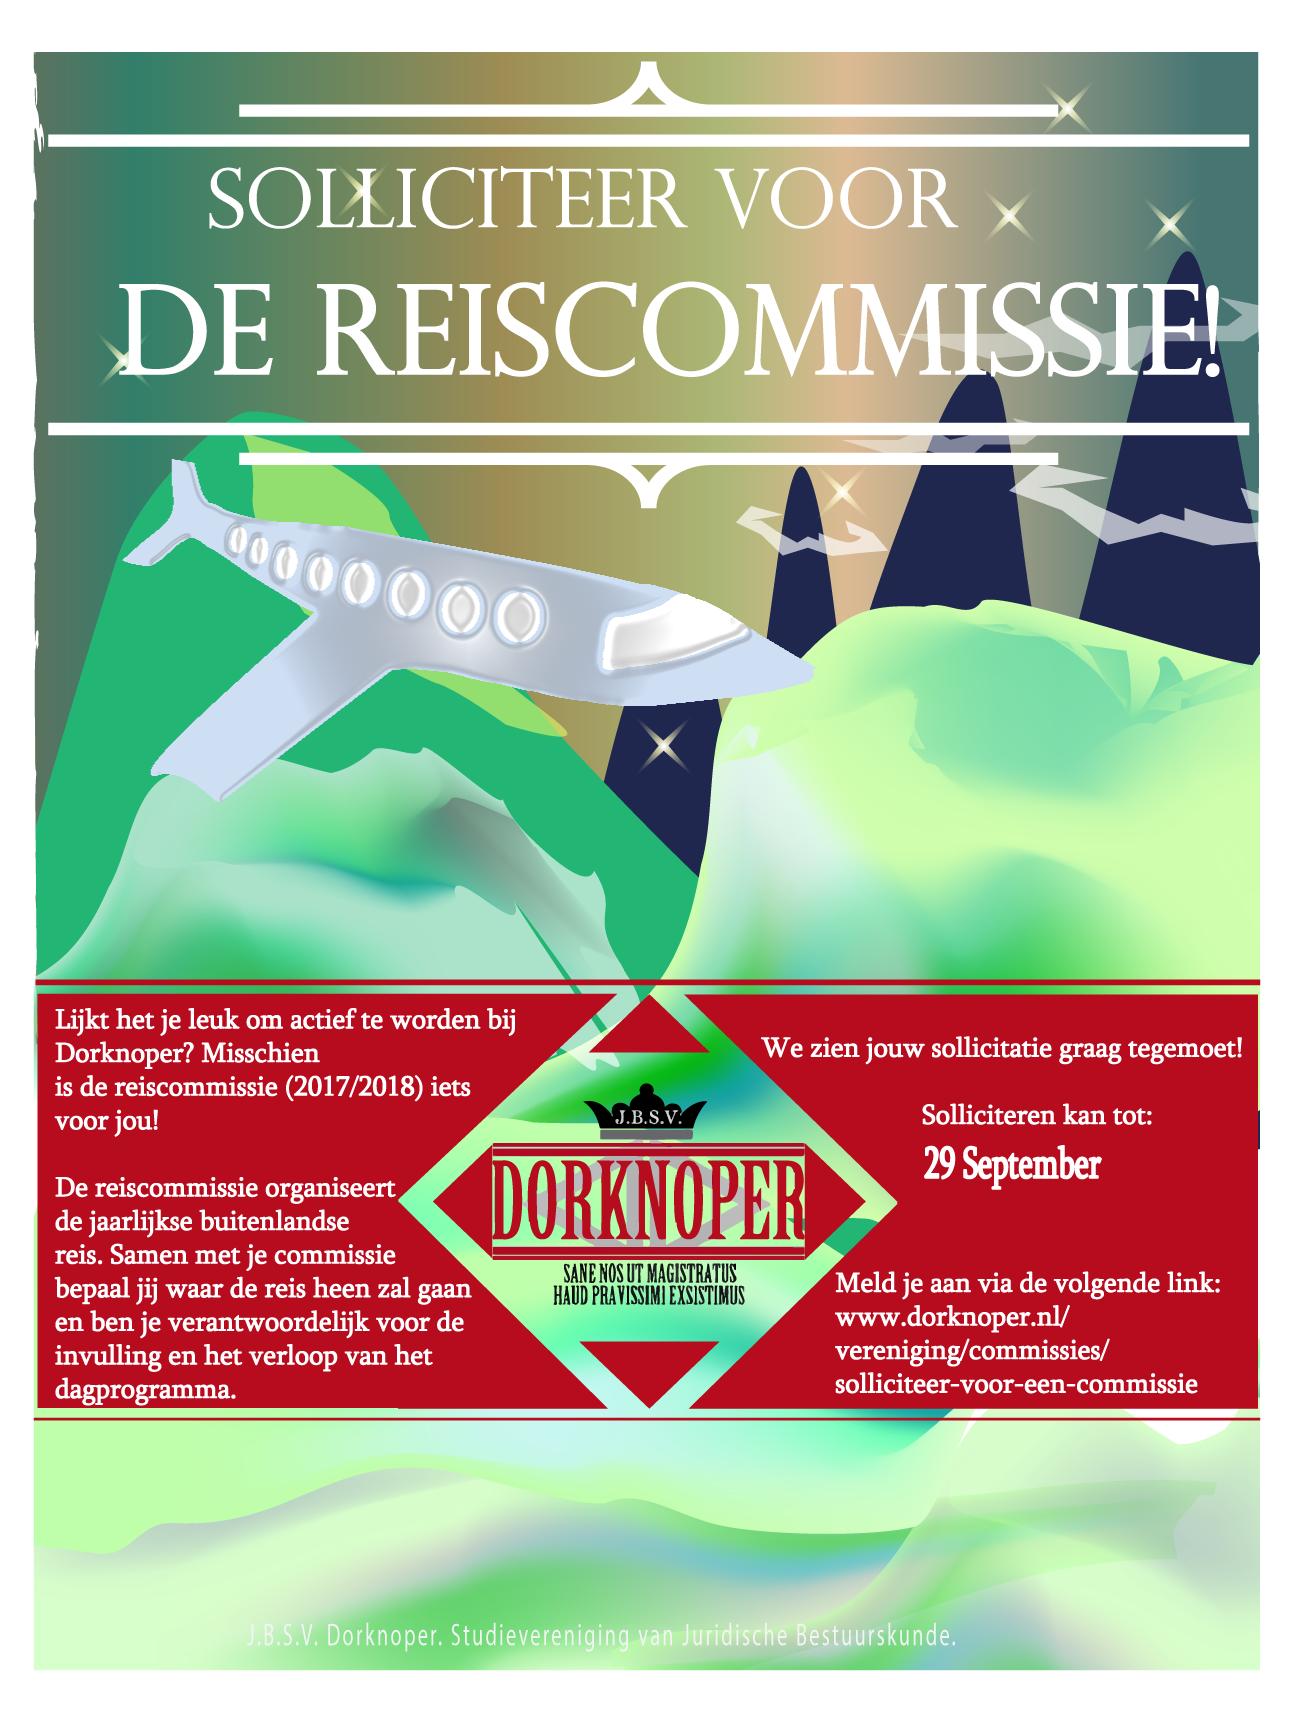 Dorknoper zoekt reiscommissie 2017/2018